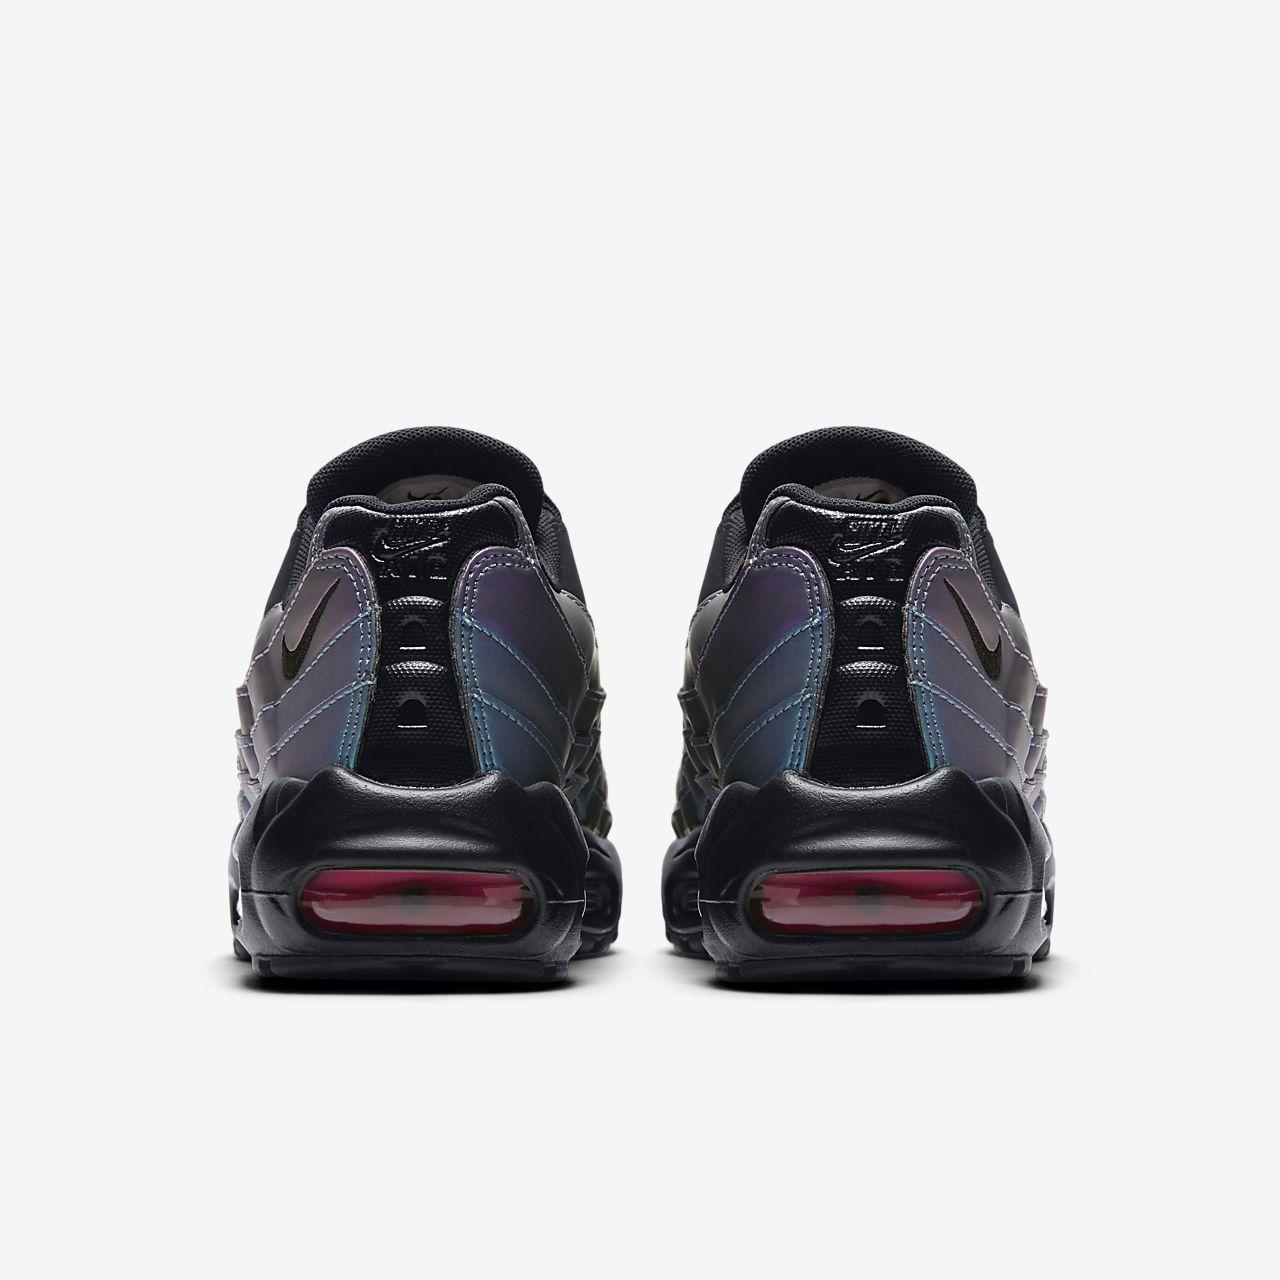 71a40e62da3 Chaussure Nike Air Max 95 RF pour Femme. Nike.com CA